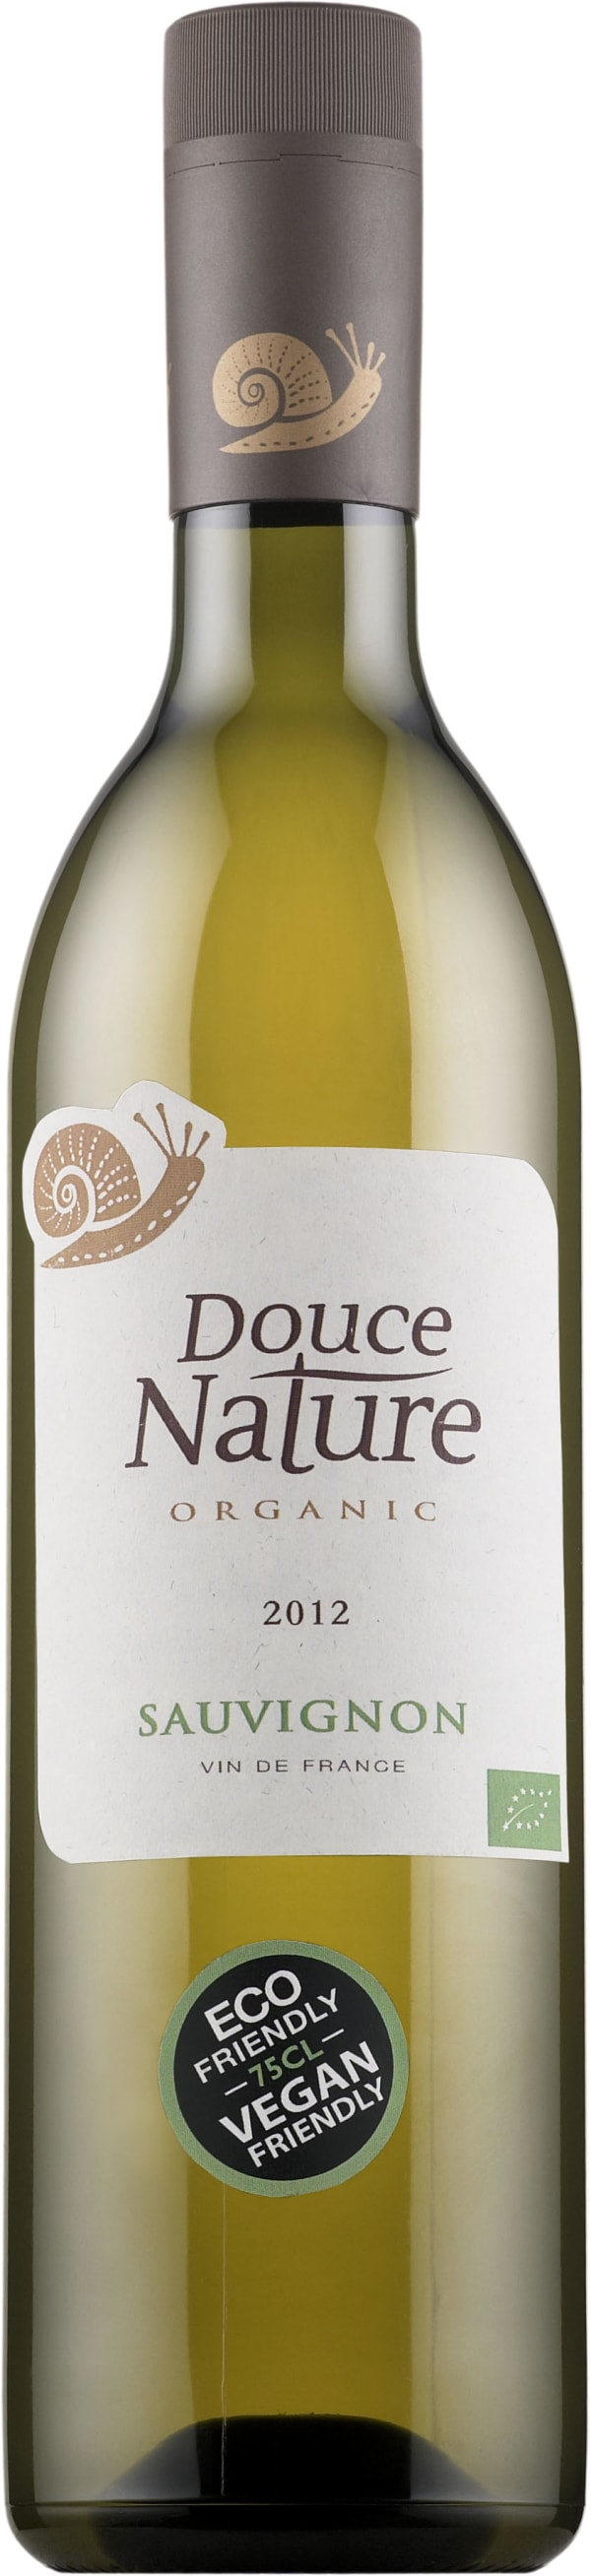 Douce Nature Organic Sauvignon Blanc 2015 muovipullo